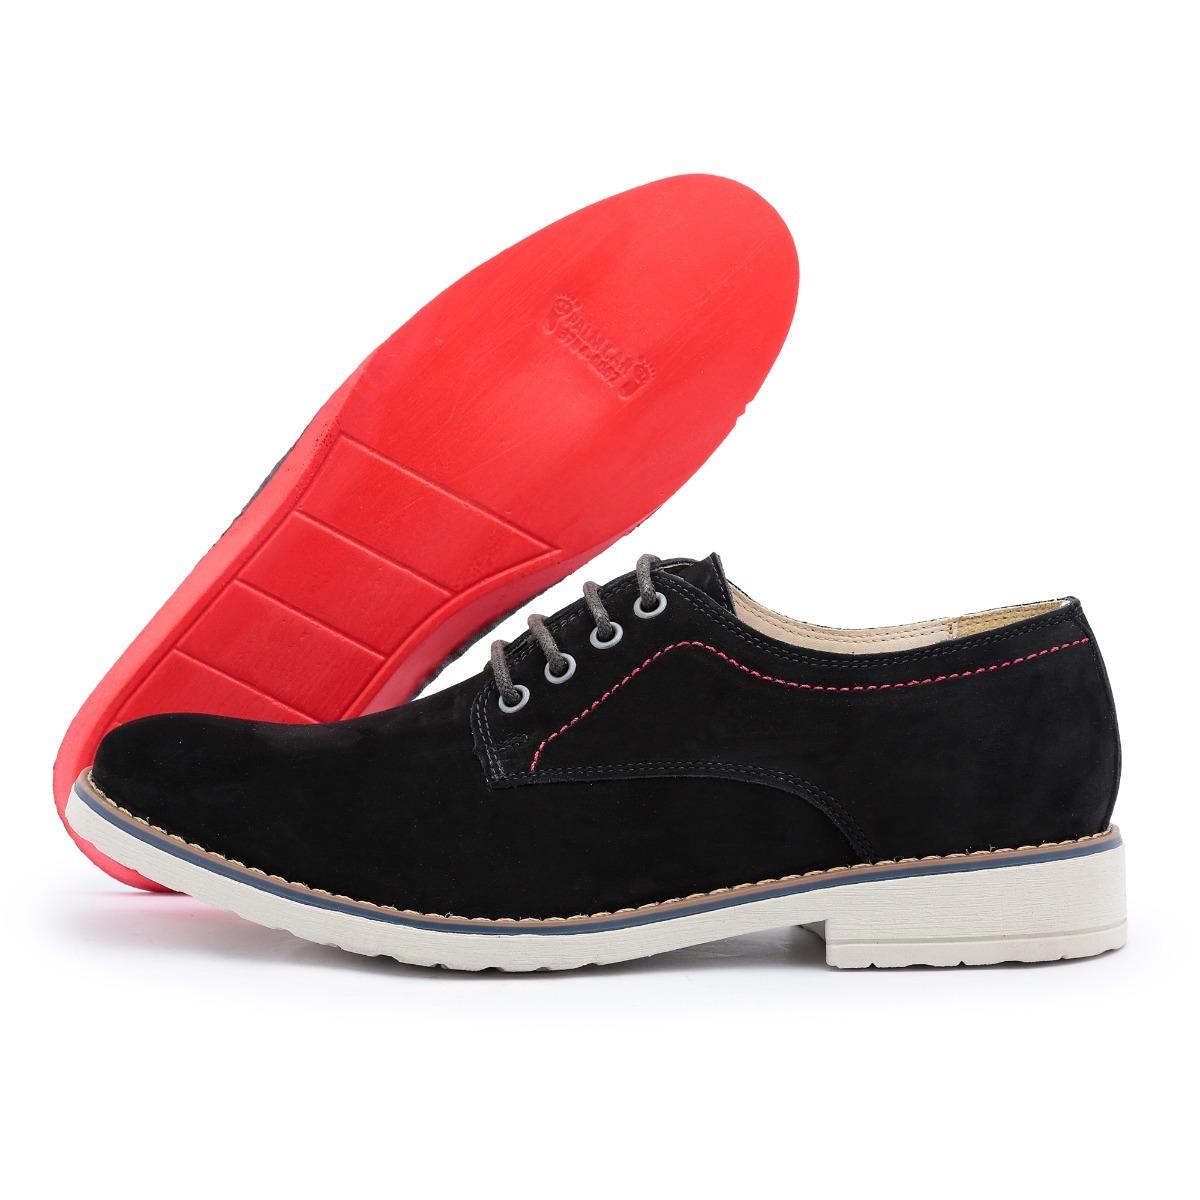 d225fcb1a sapato casual social masculino em couro bergally lancamento. Carregando  zoom.